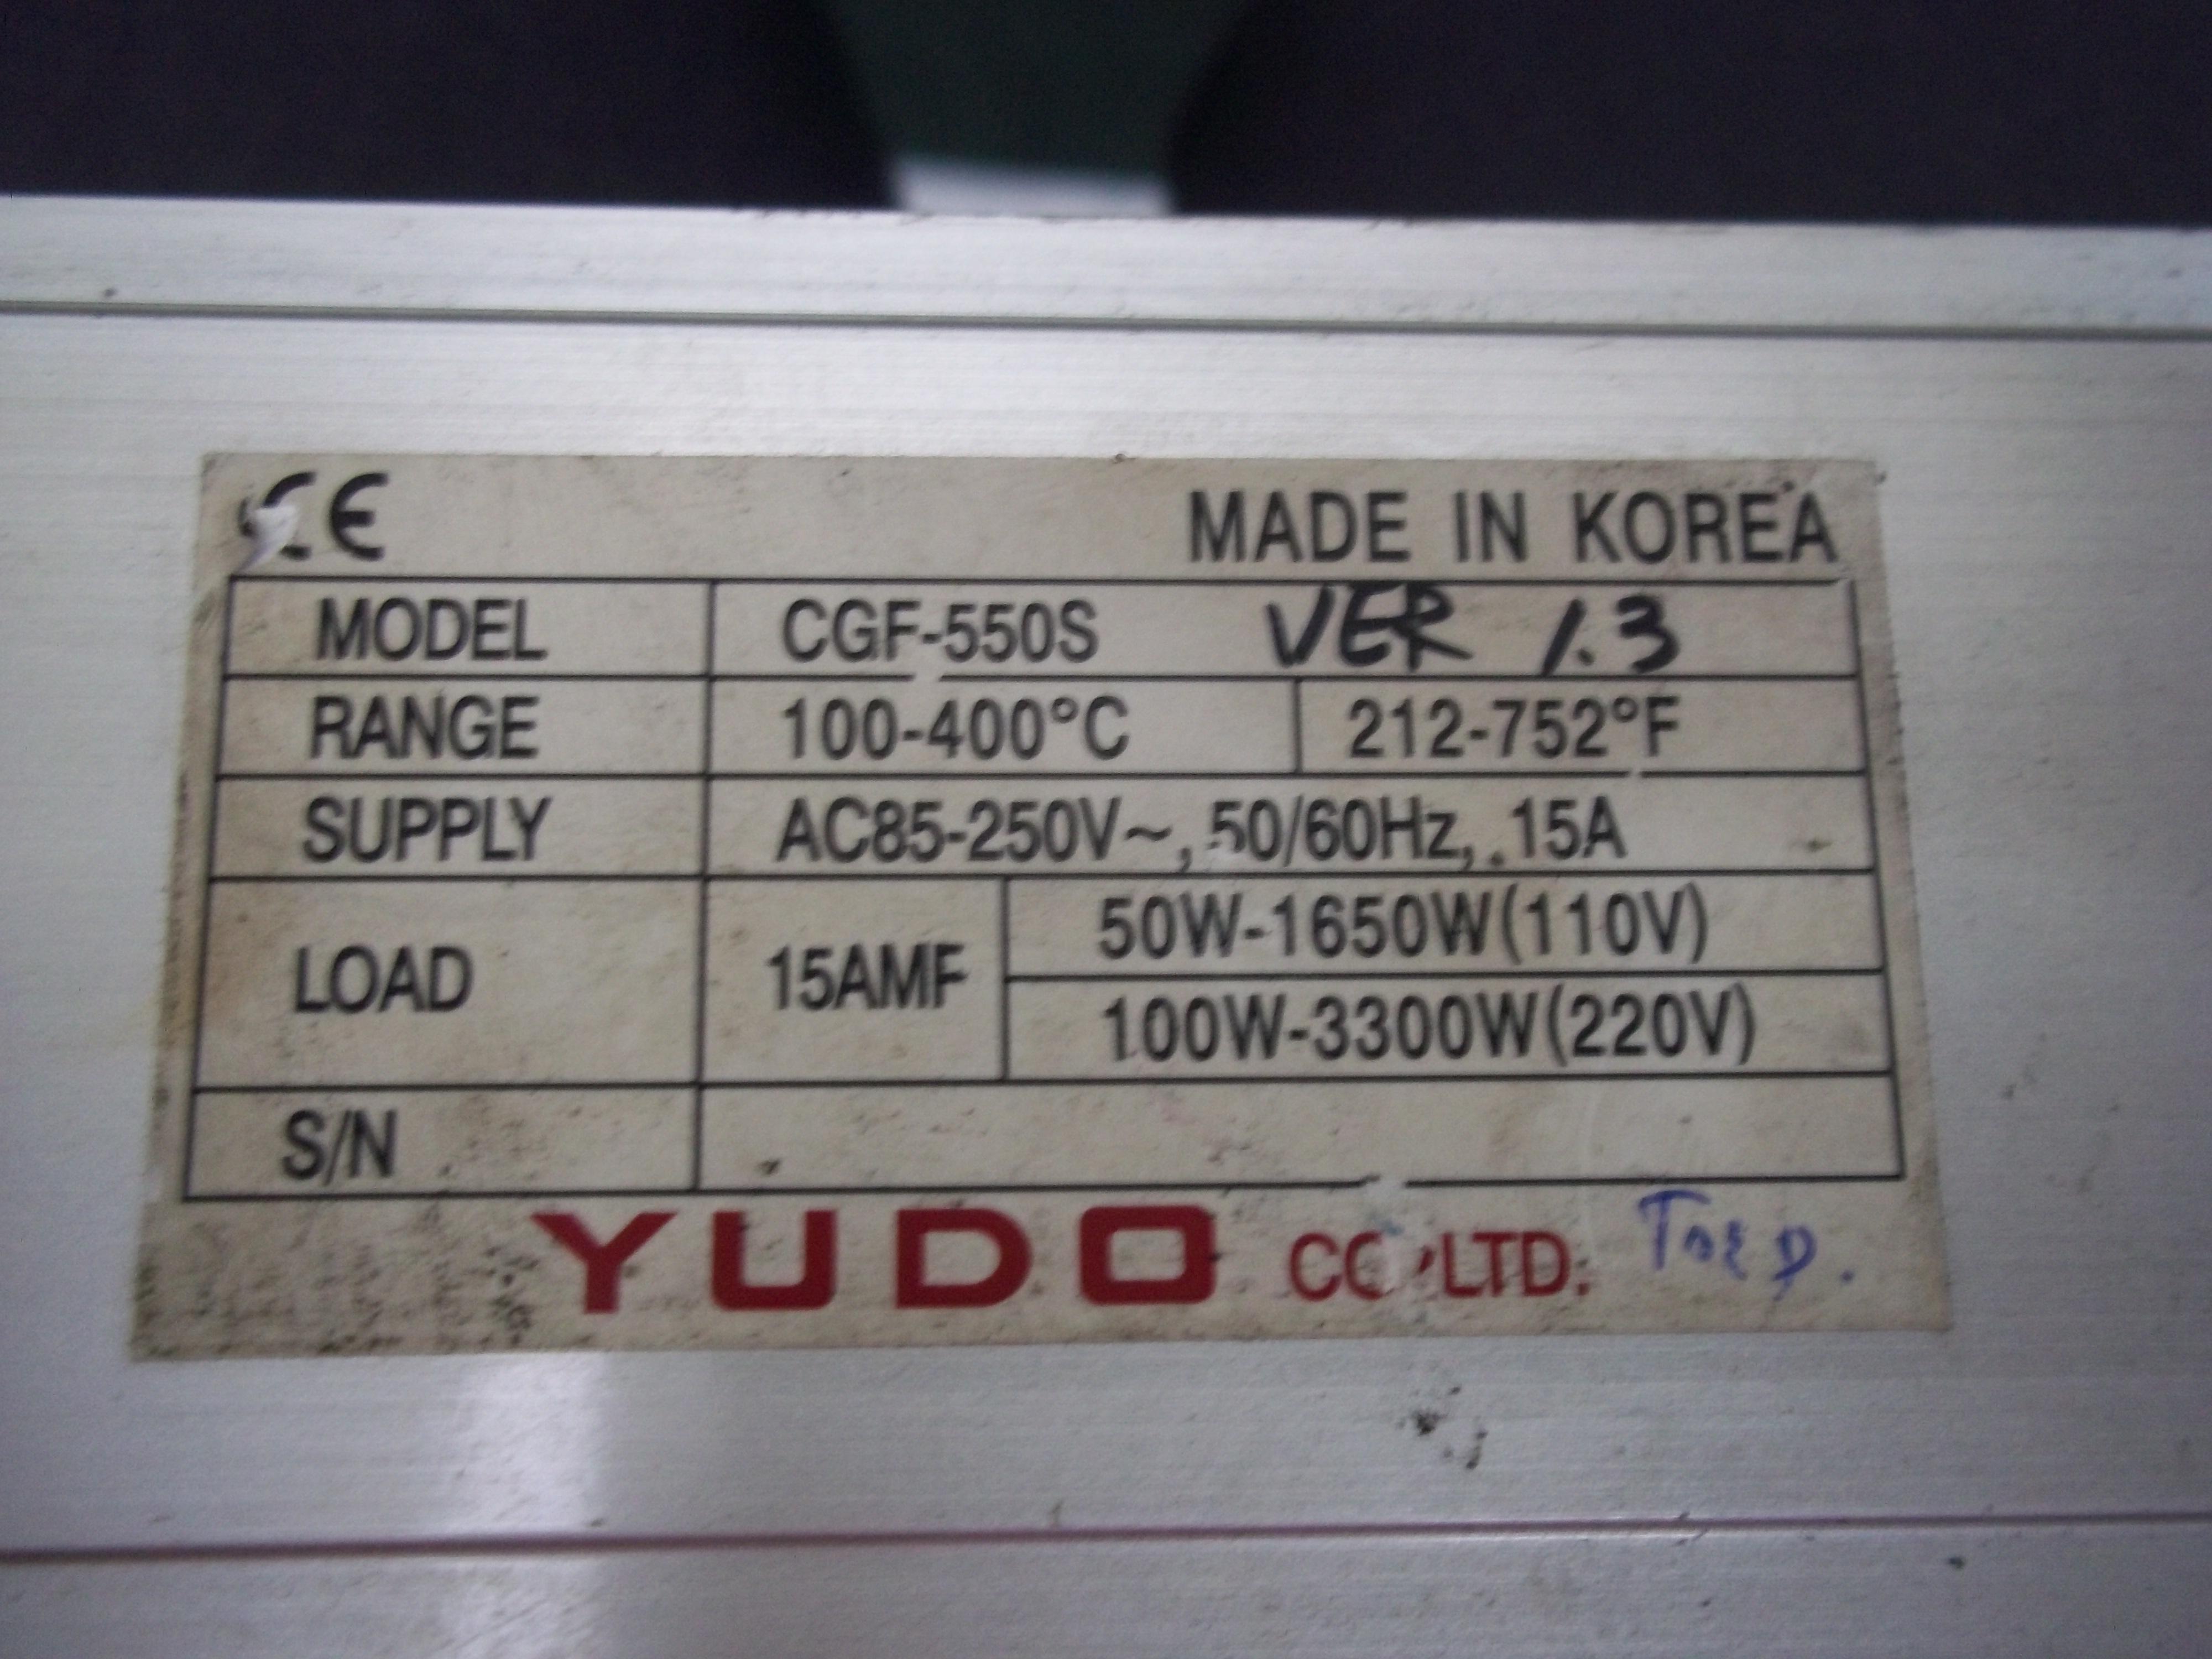 Repair CGF-550S YUDO YUDO MICOM CONTROLLER in Malaysia, Singapore, Thailand, Indonesia